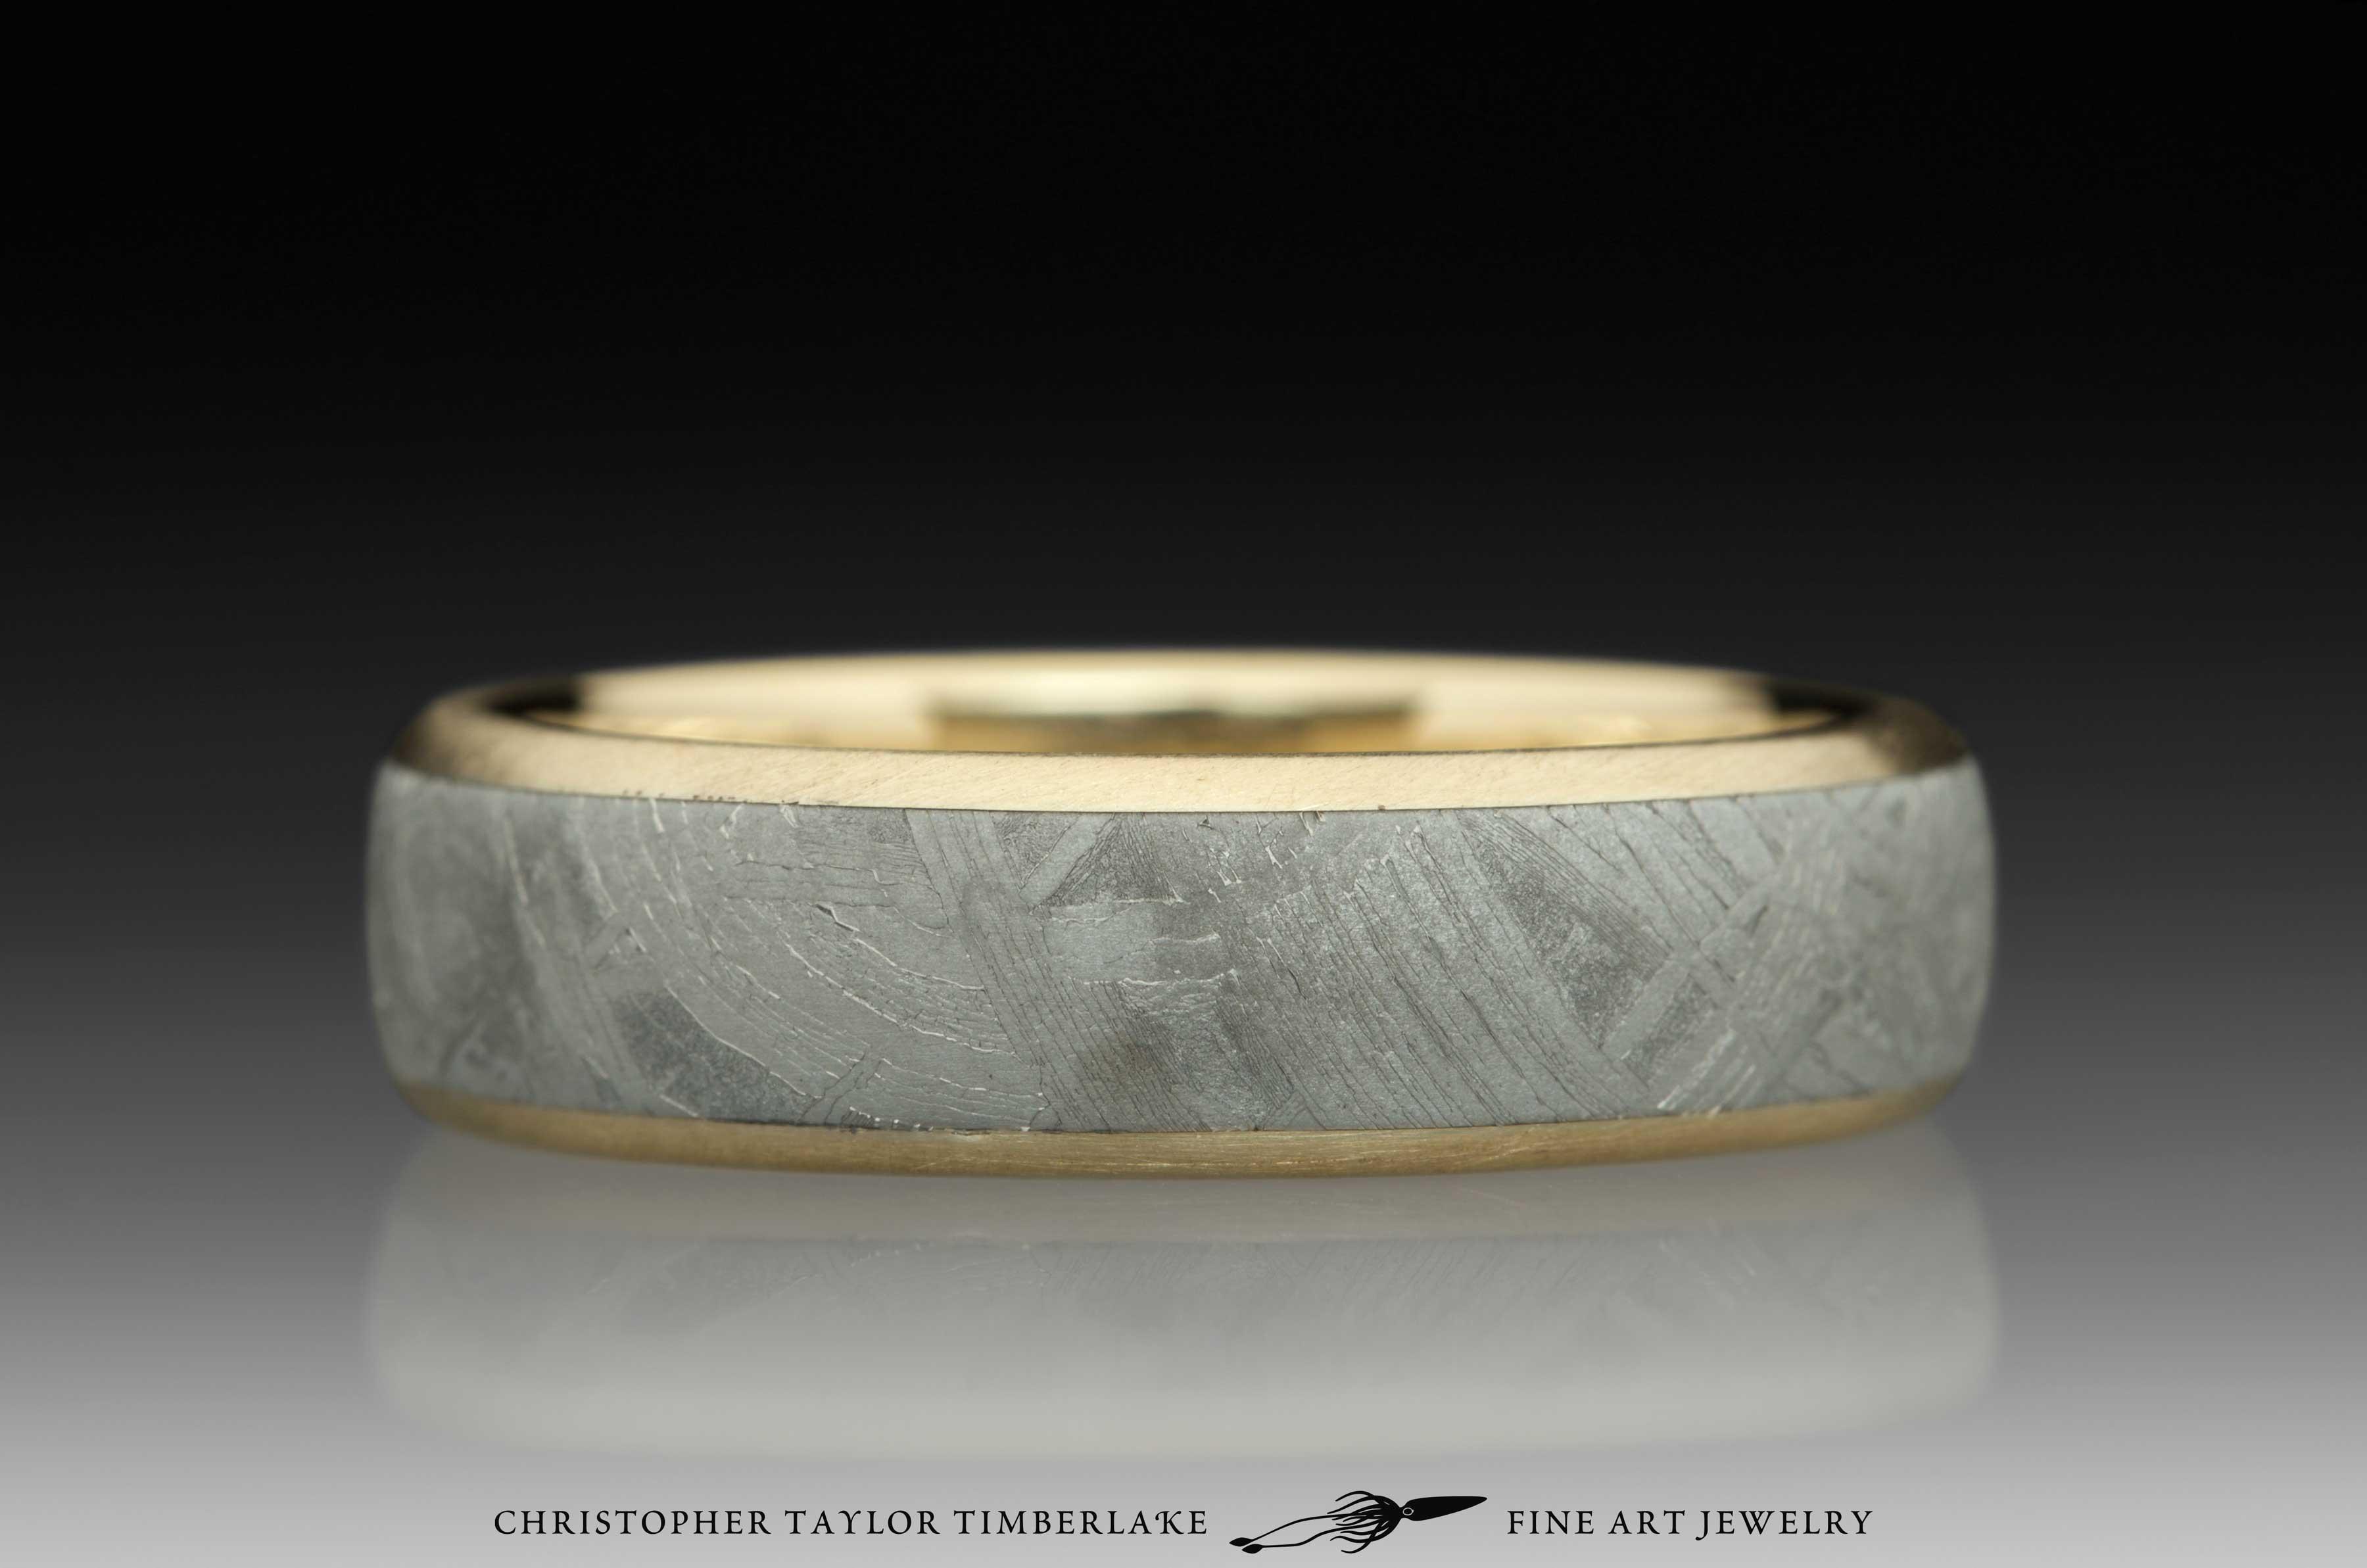 Meteorite-14K-karat-yellow-gold-ring,-domed,-etched,-(.75-4.5-.75)-6mm,-14K-yellow-gold-rims-3